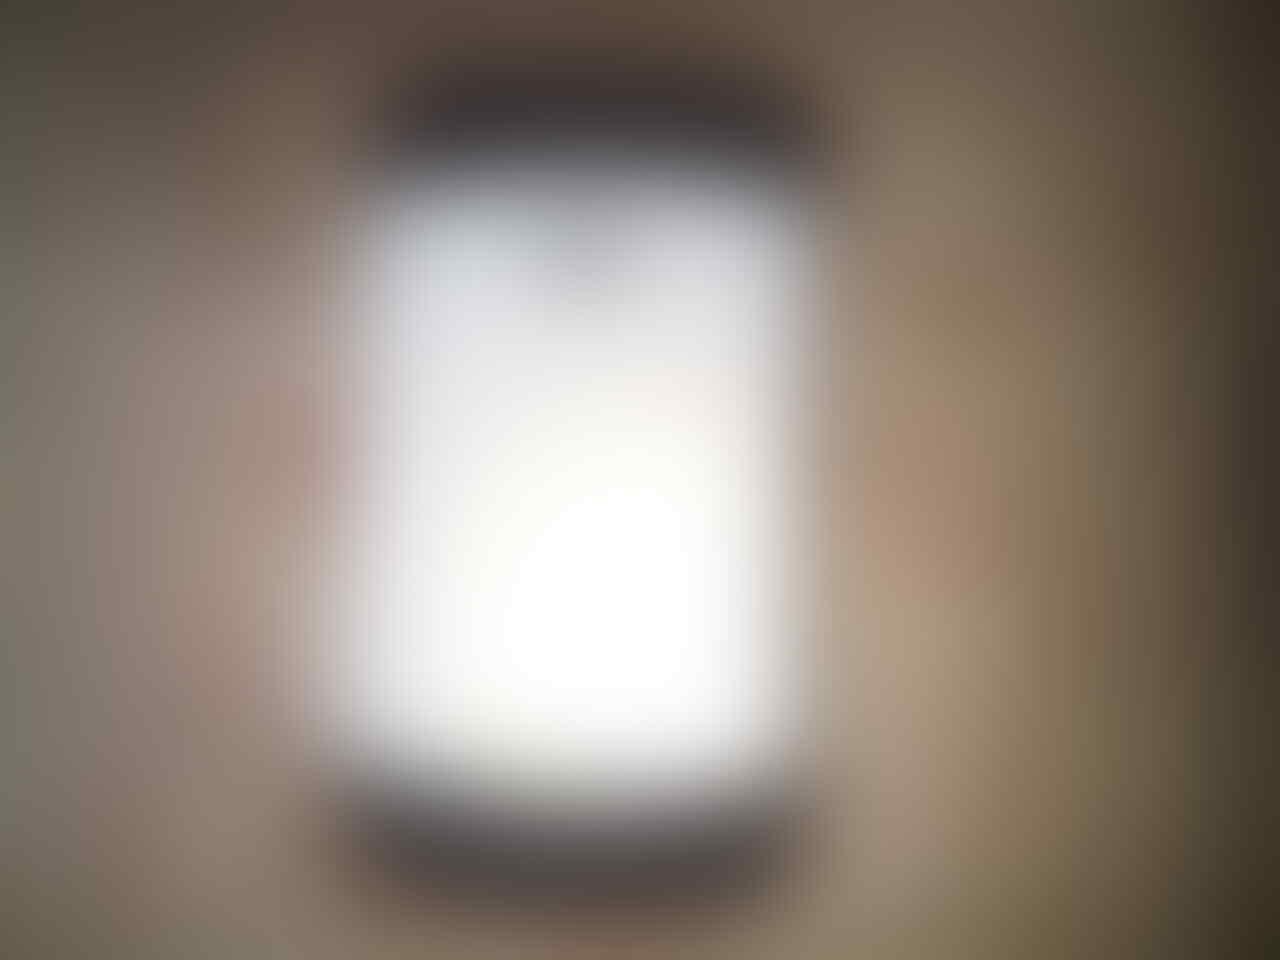 blackberry gemini (bb curve 8520) white mulus